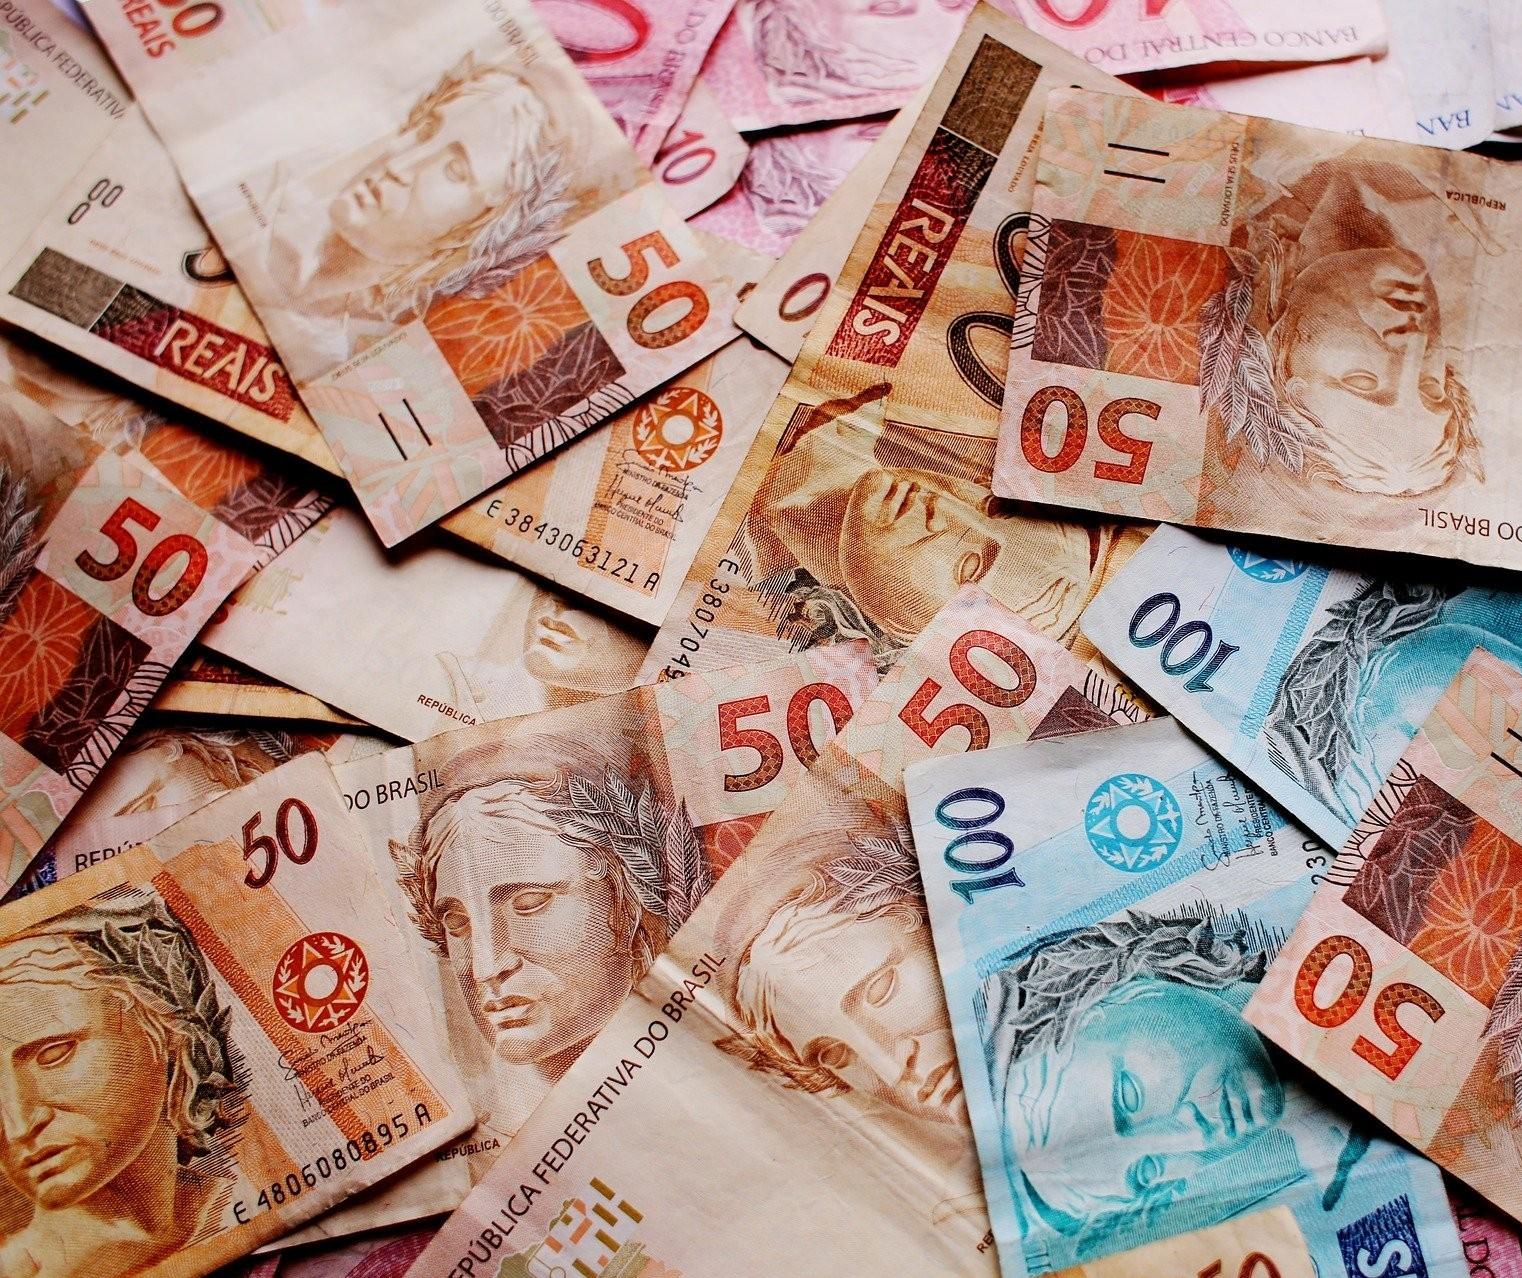 Crise das empresas se agrava com a pandemia por dificuldade de crédito